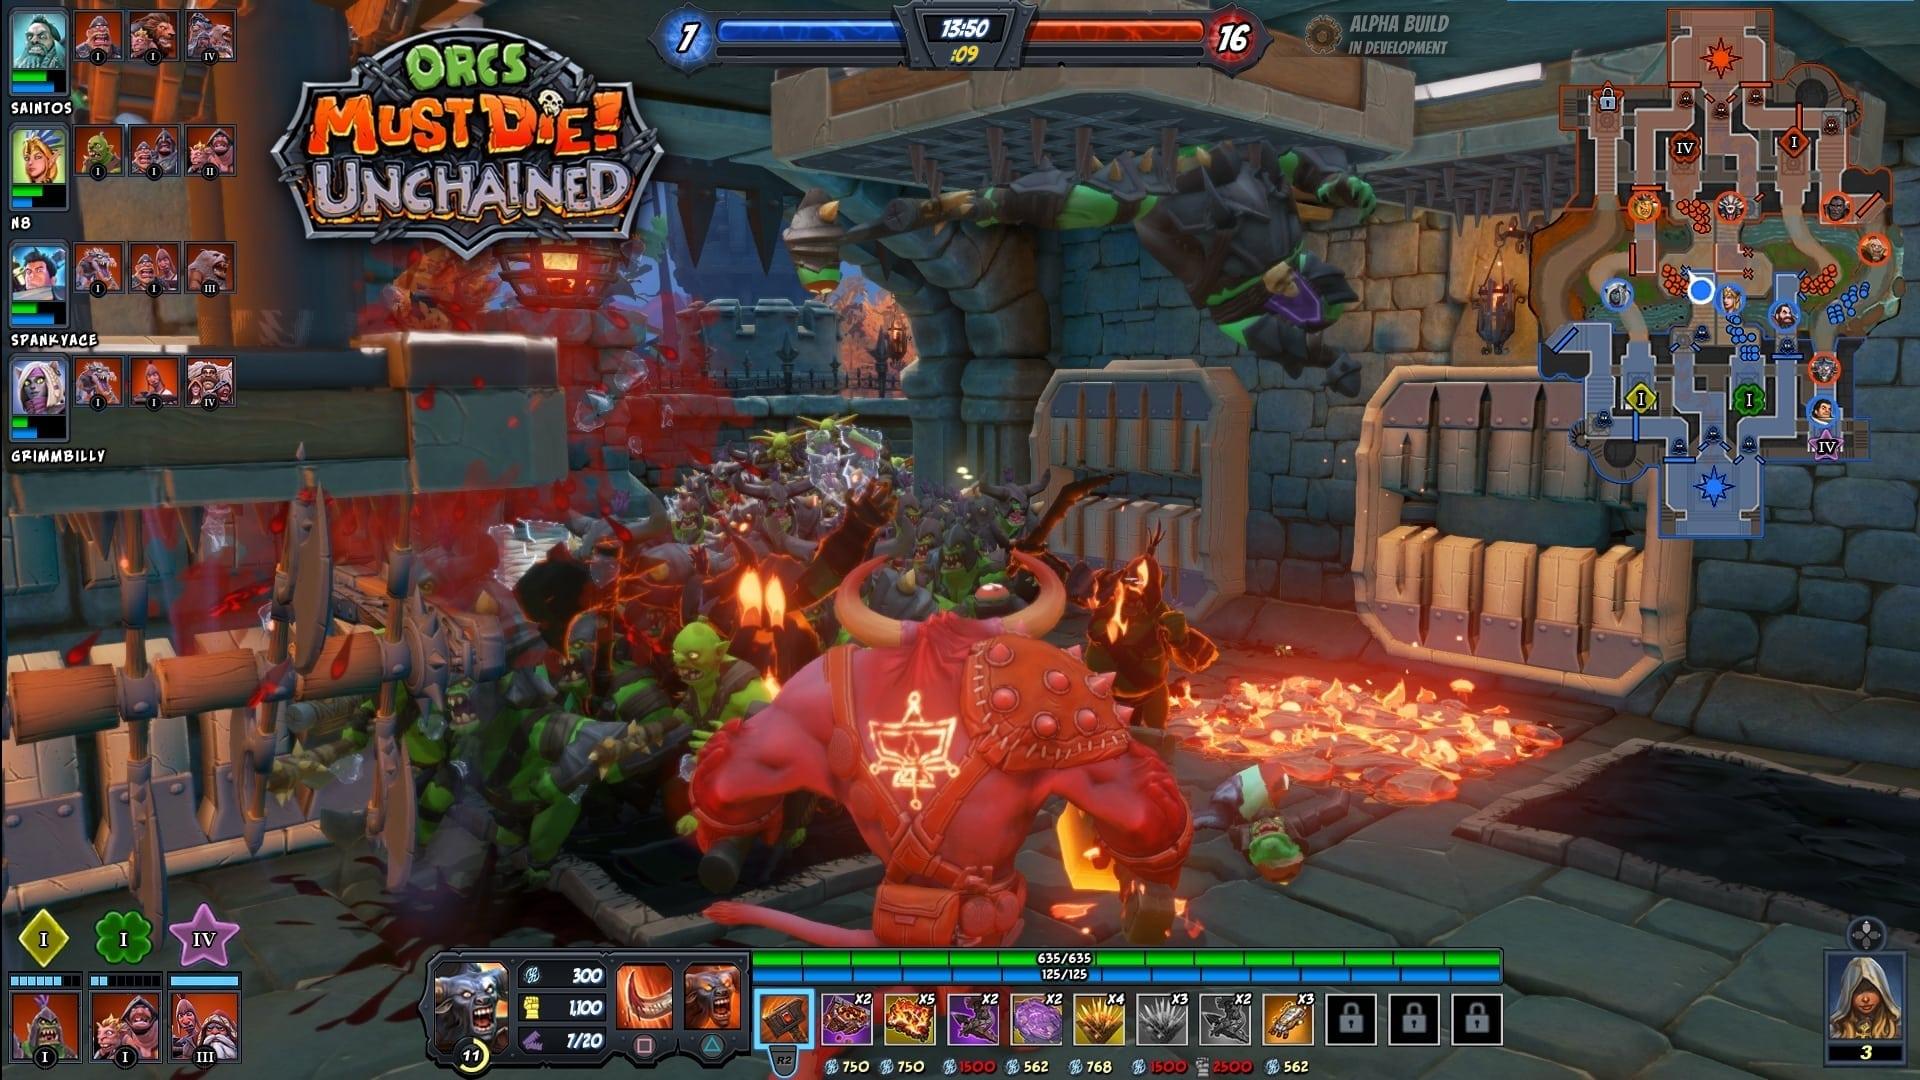 Orcs Must Die Unchained screenshot 2